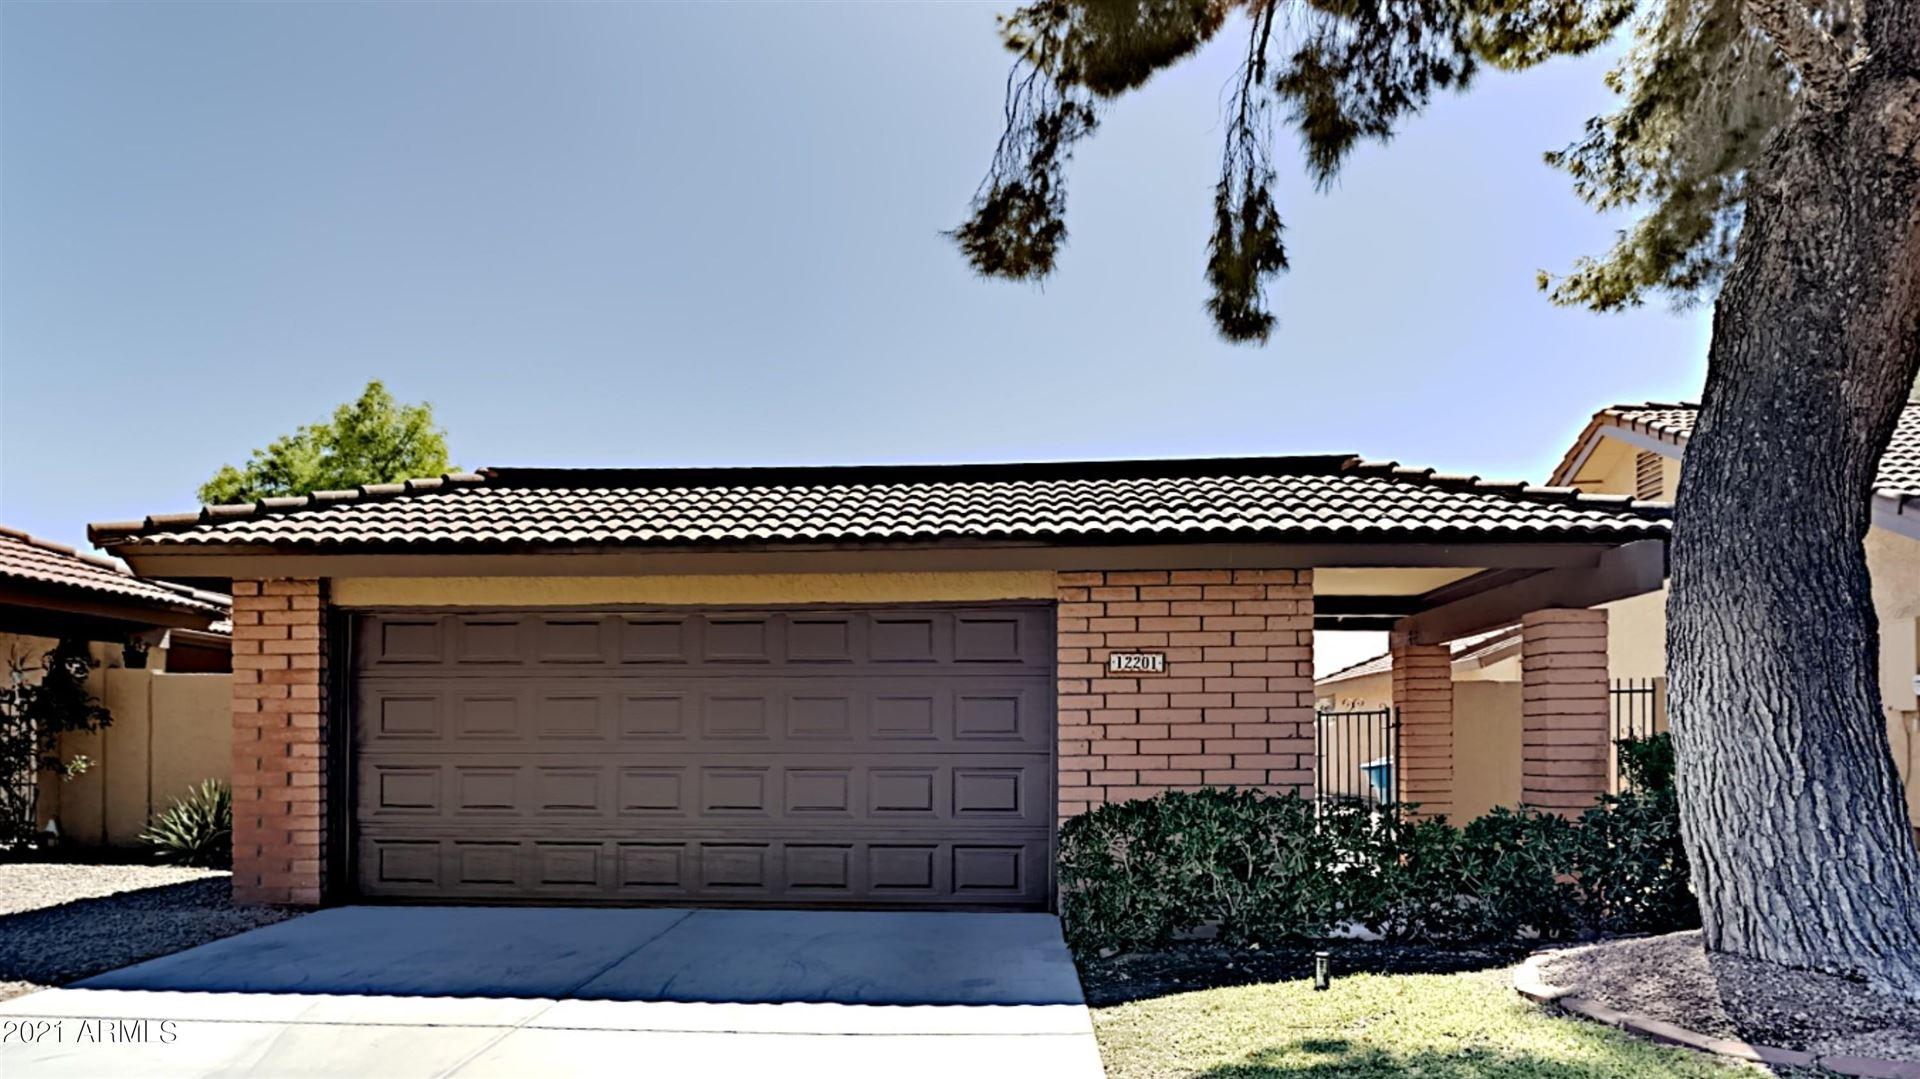 12201 S PAIUTE Street, Phoenix, AZ 85044 - MLS#: 6240985